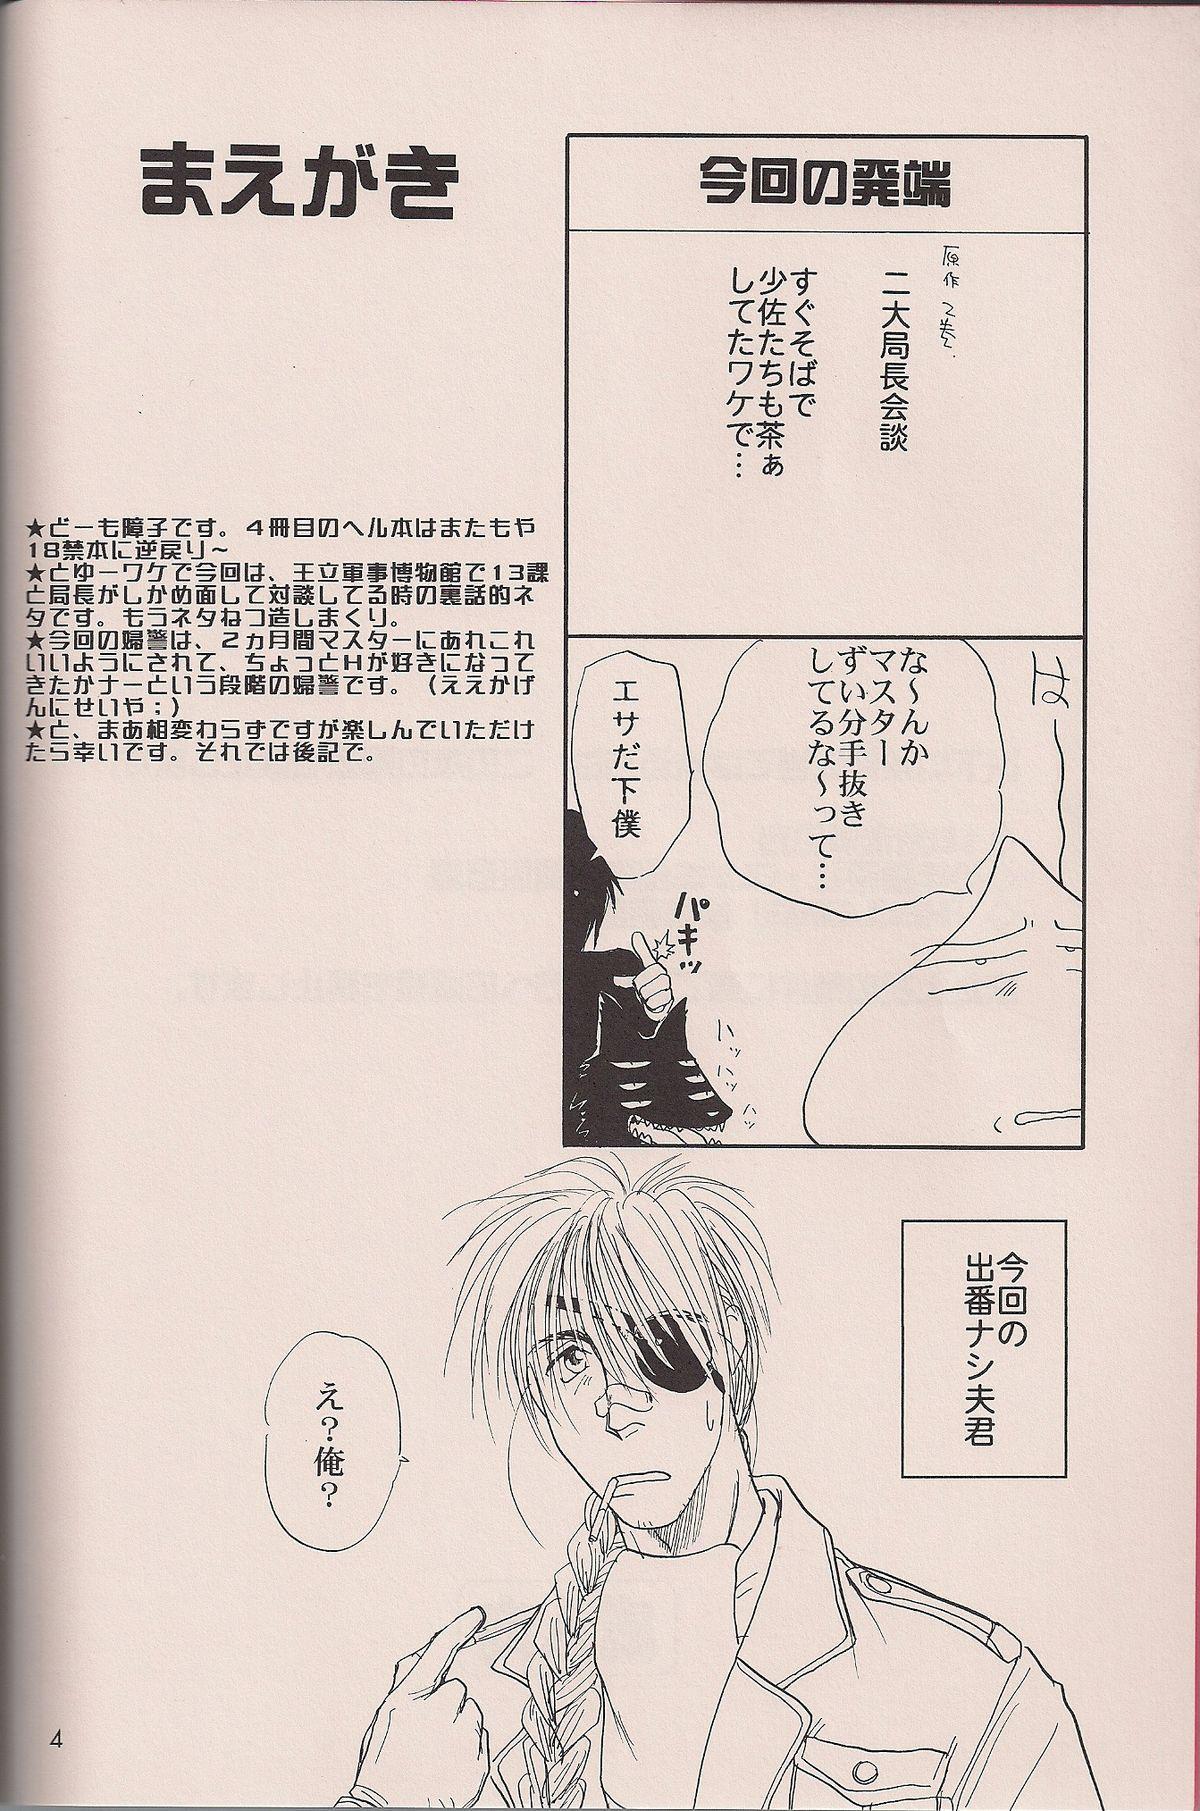 Enzai no Kiroku 2